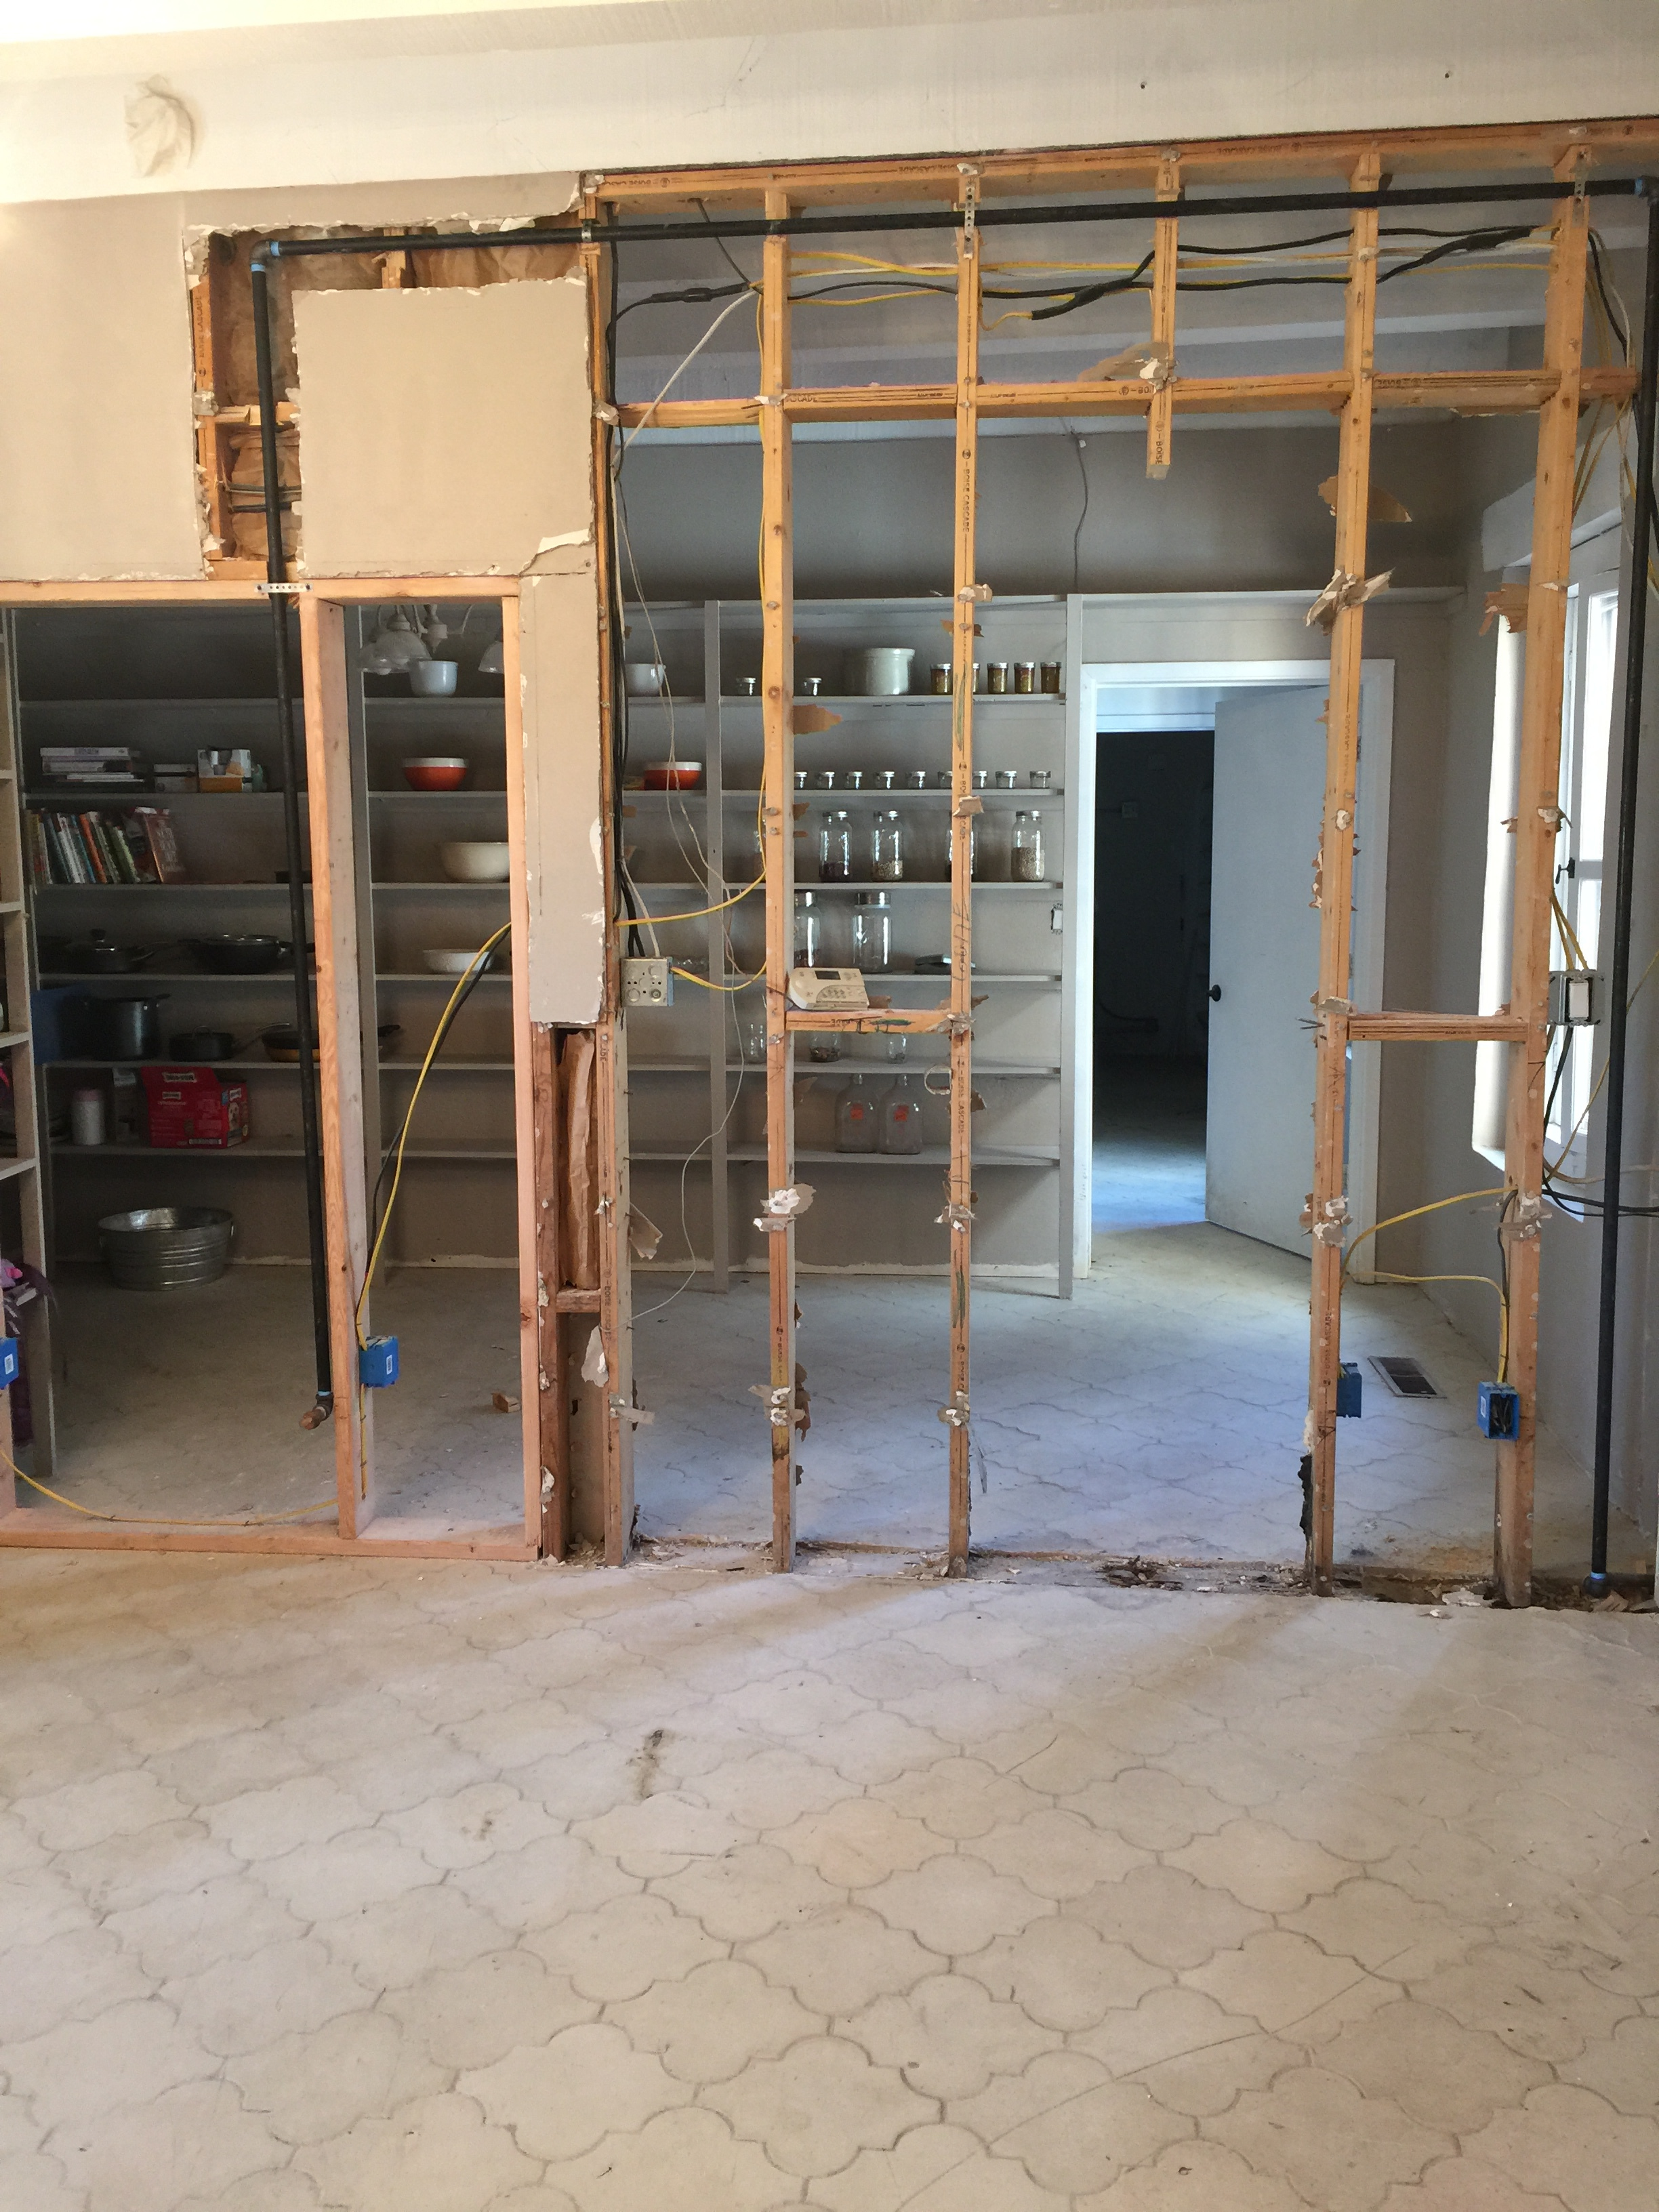 A New Mexico Farmhouse: Renovation- 4